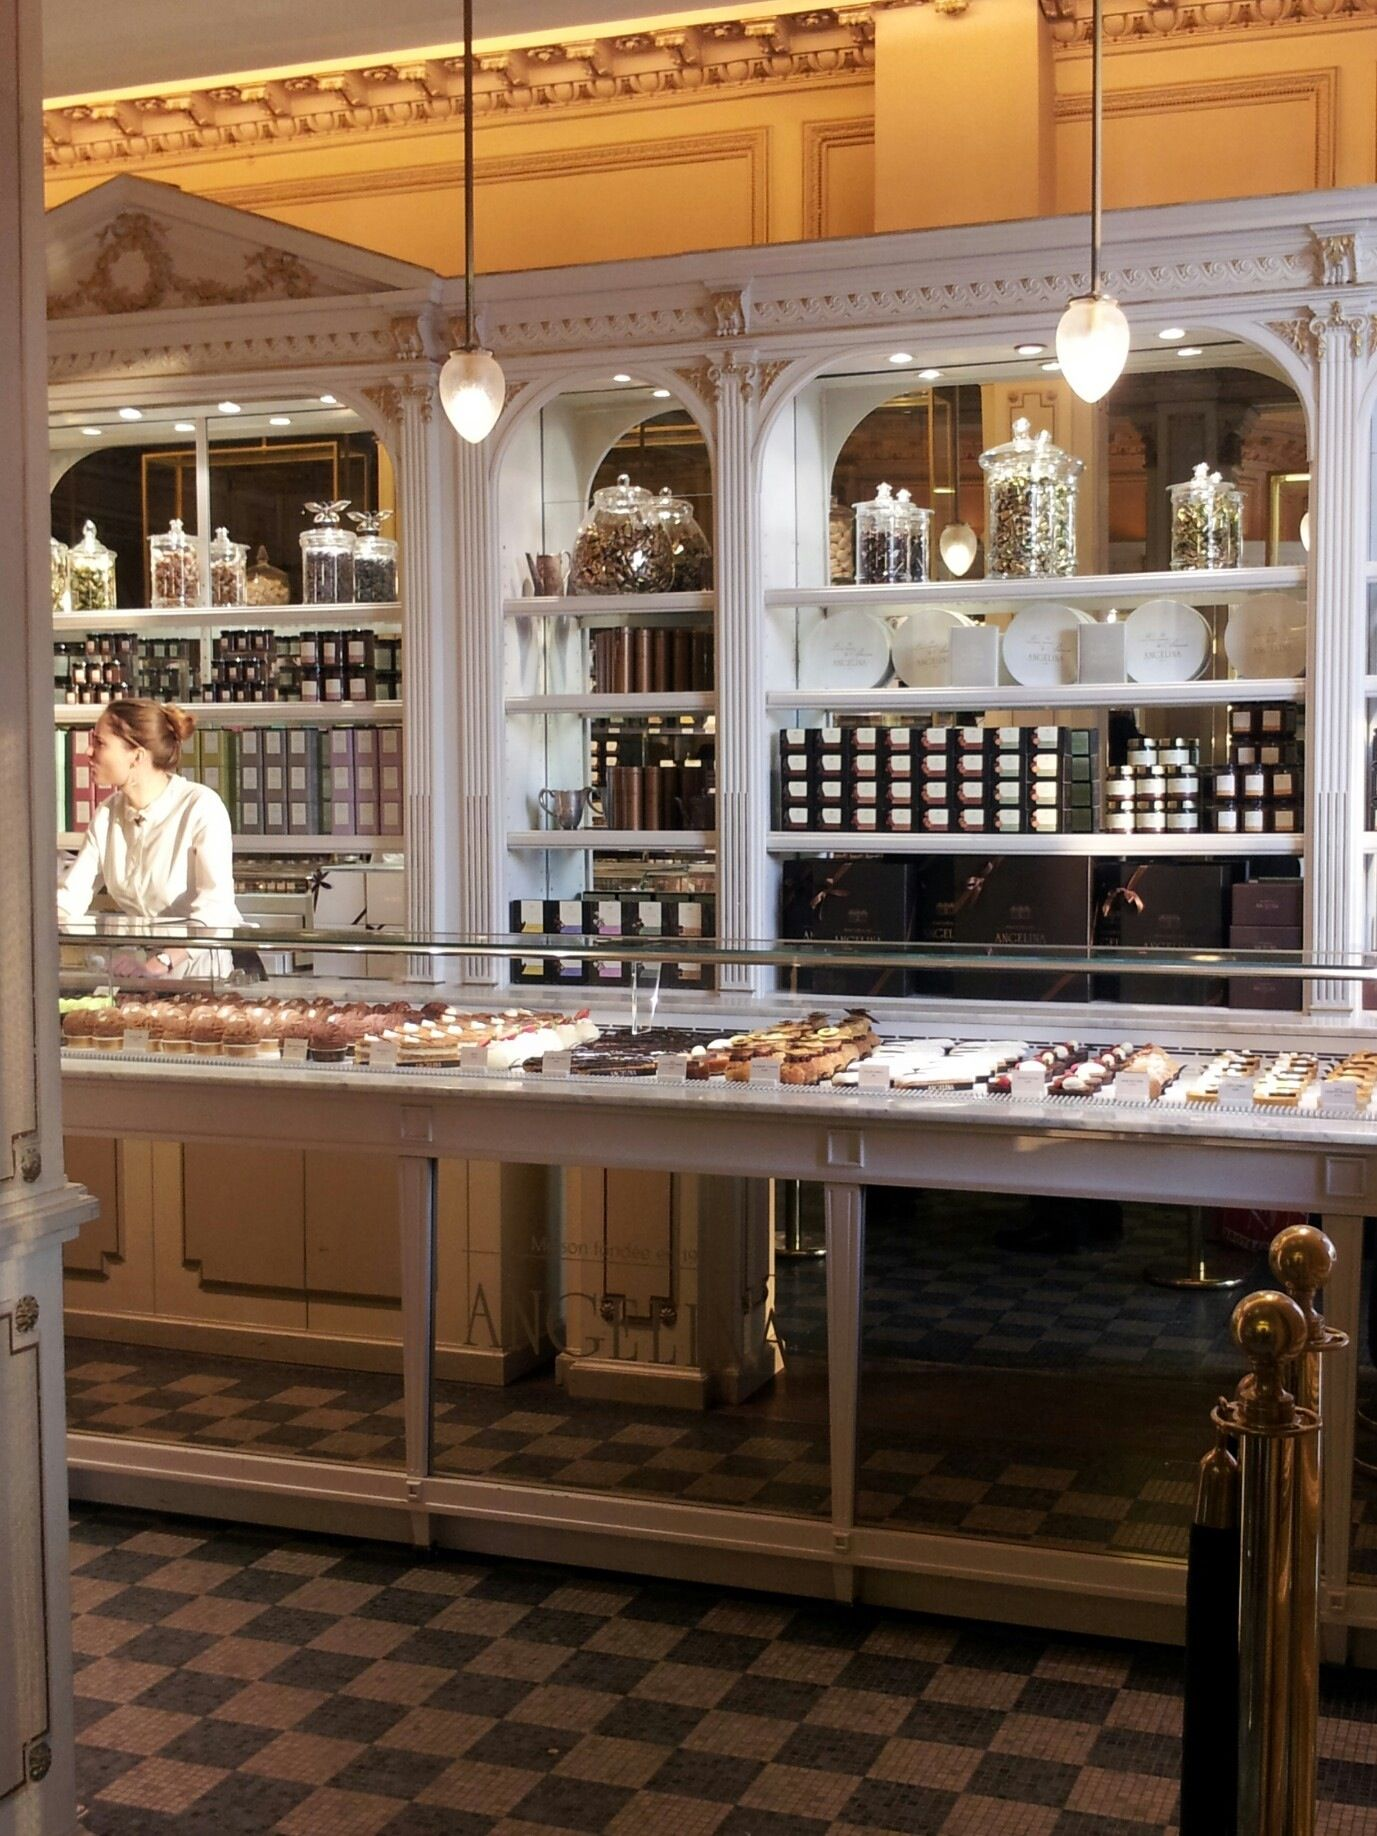 Paris angelina rue de rivoli best hot chocolate in the world like melted chocolate bars - Salon de the rue de rivoli ...